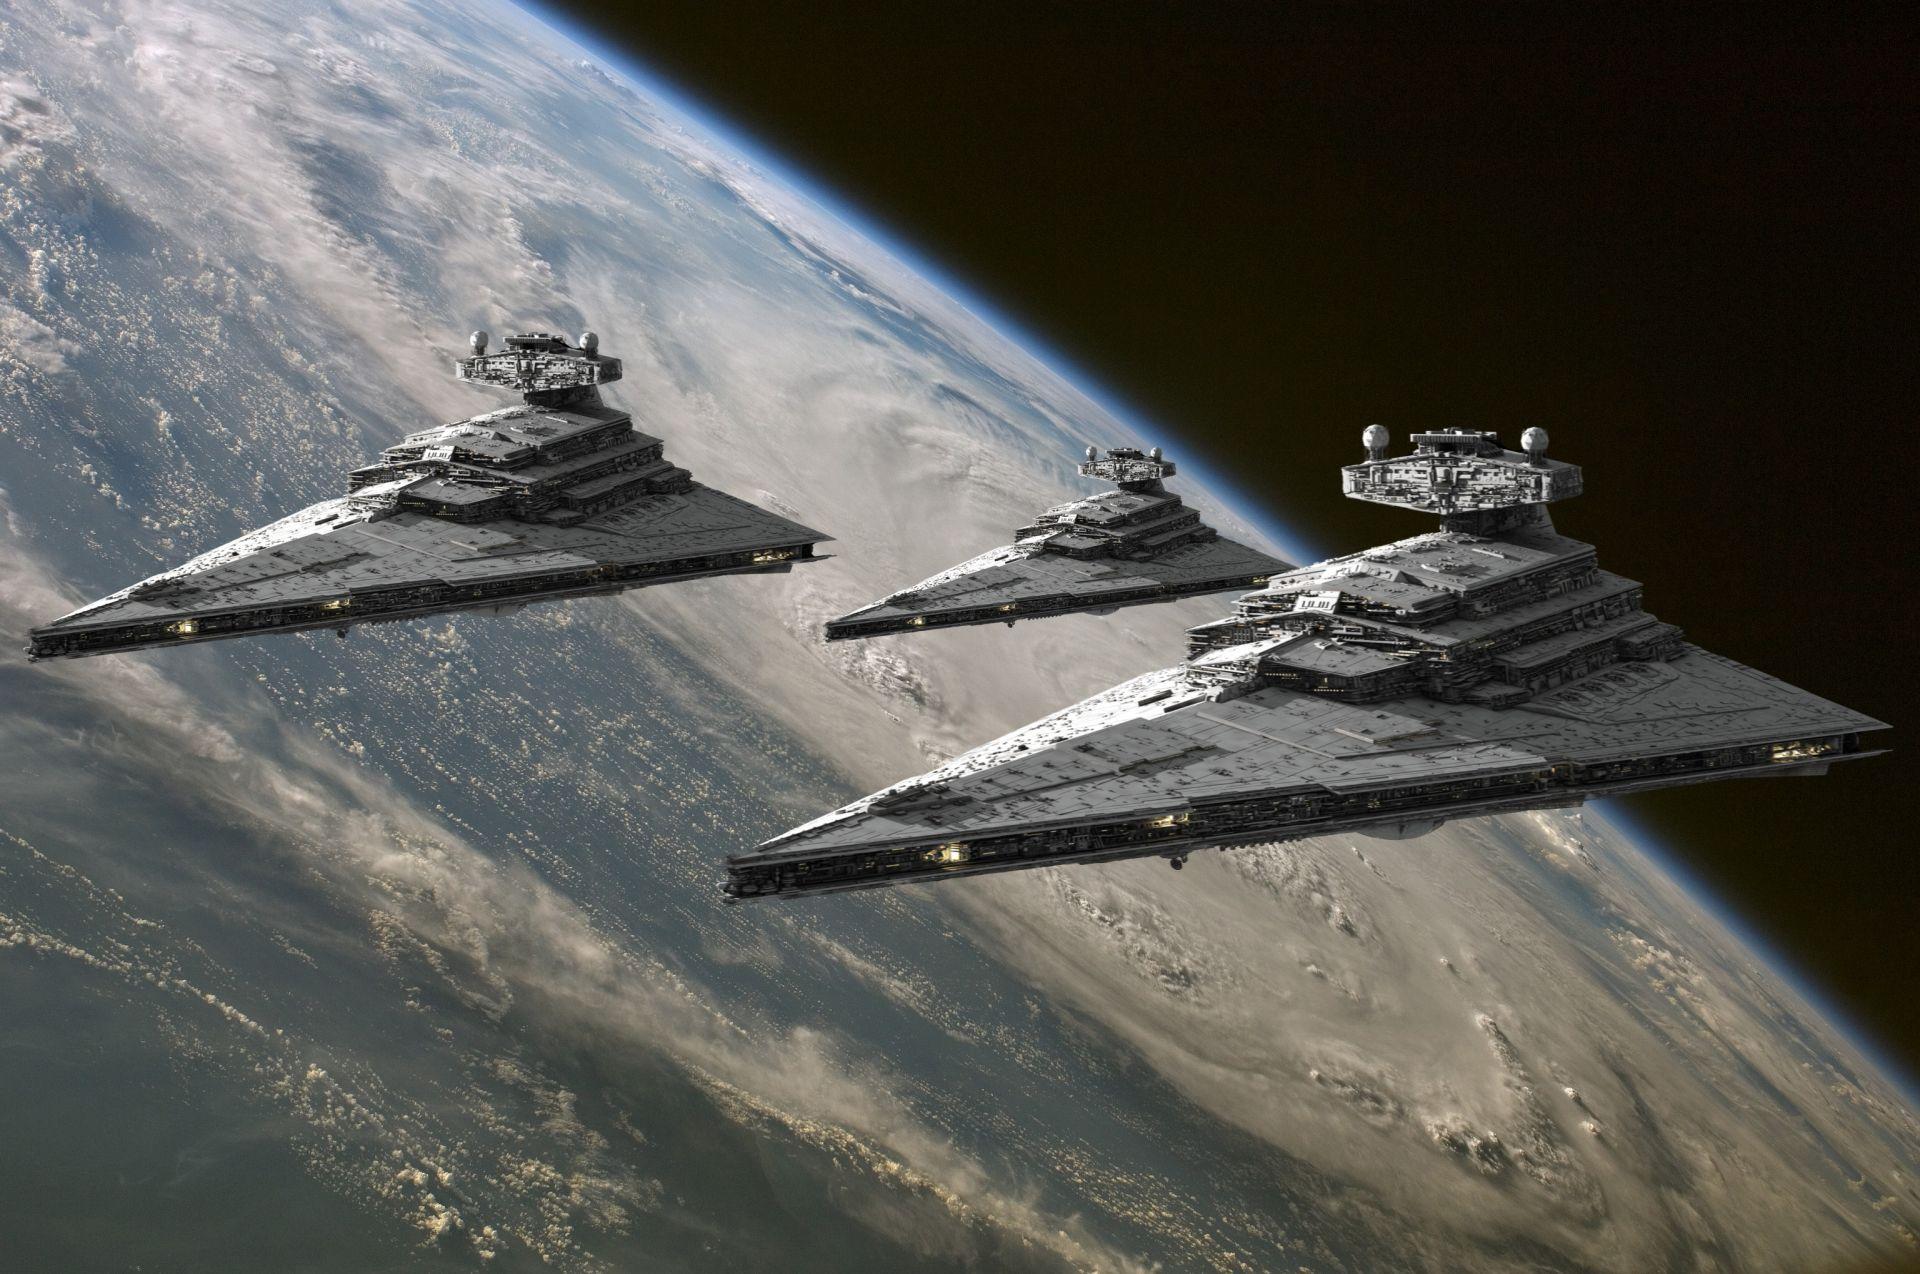 Star Wars Screensaver Cool Wallpaper